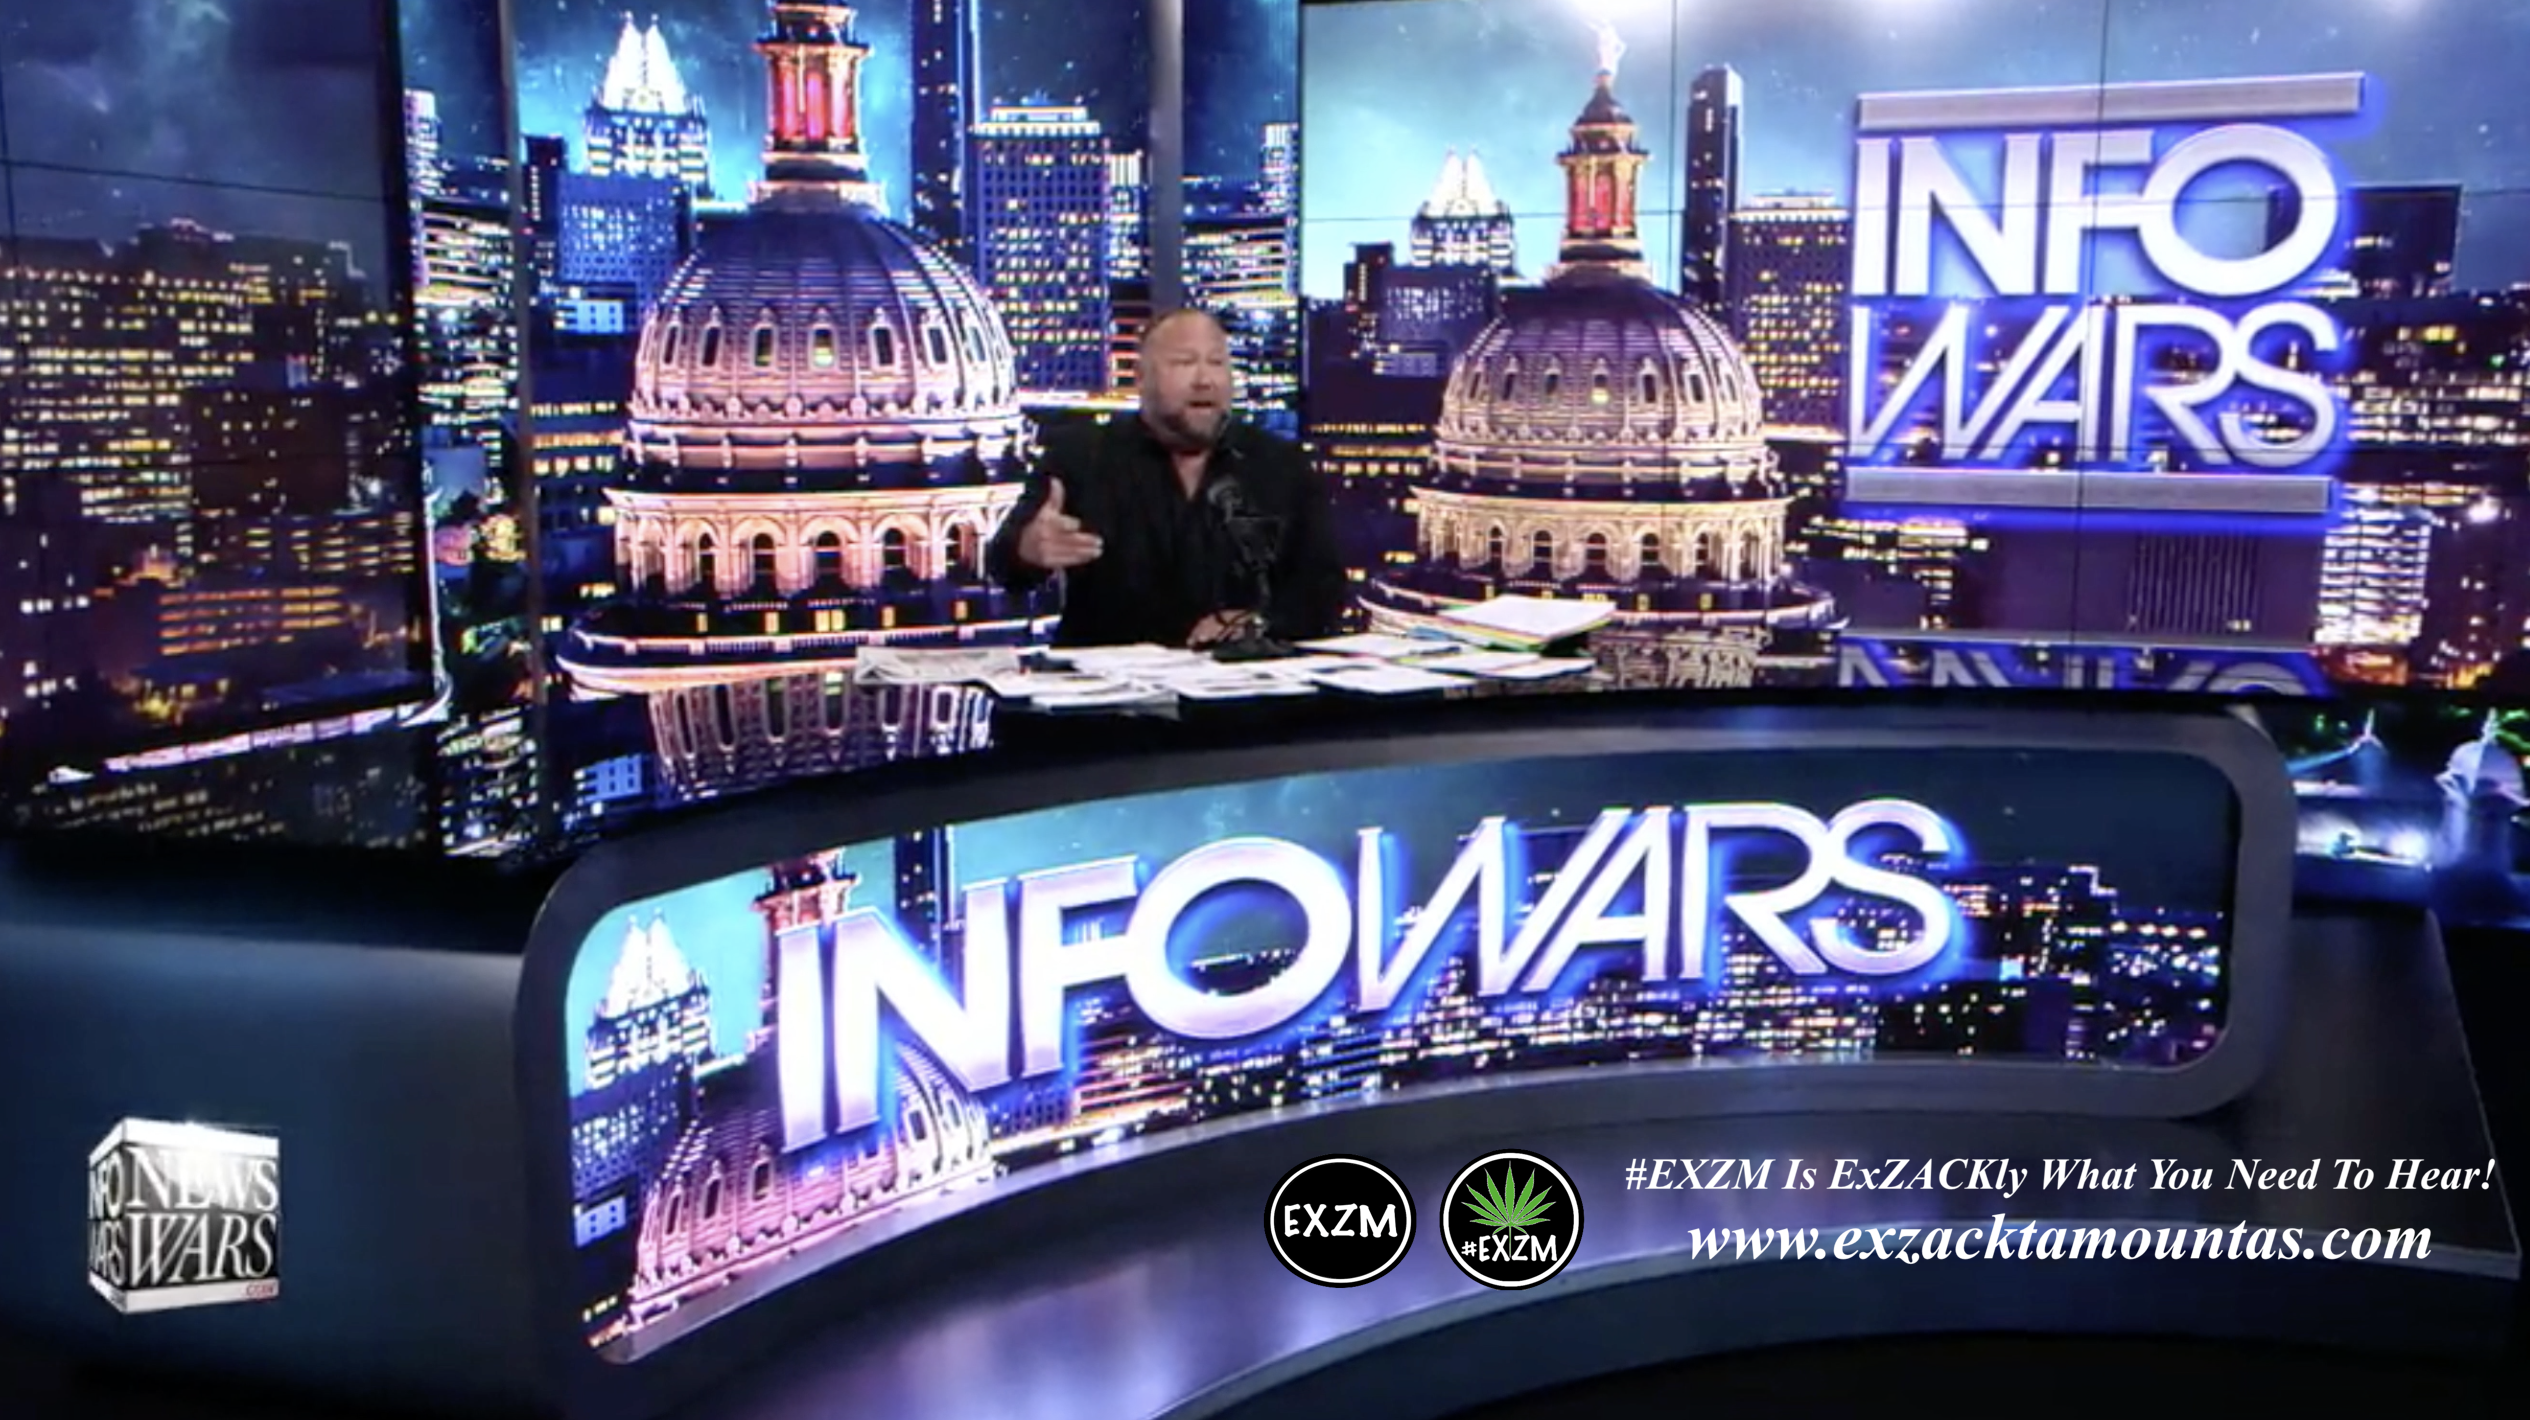 Alex Jones Live In Infowars Studio EXZM Zack Mount May 24th 2021 copy